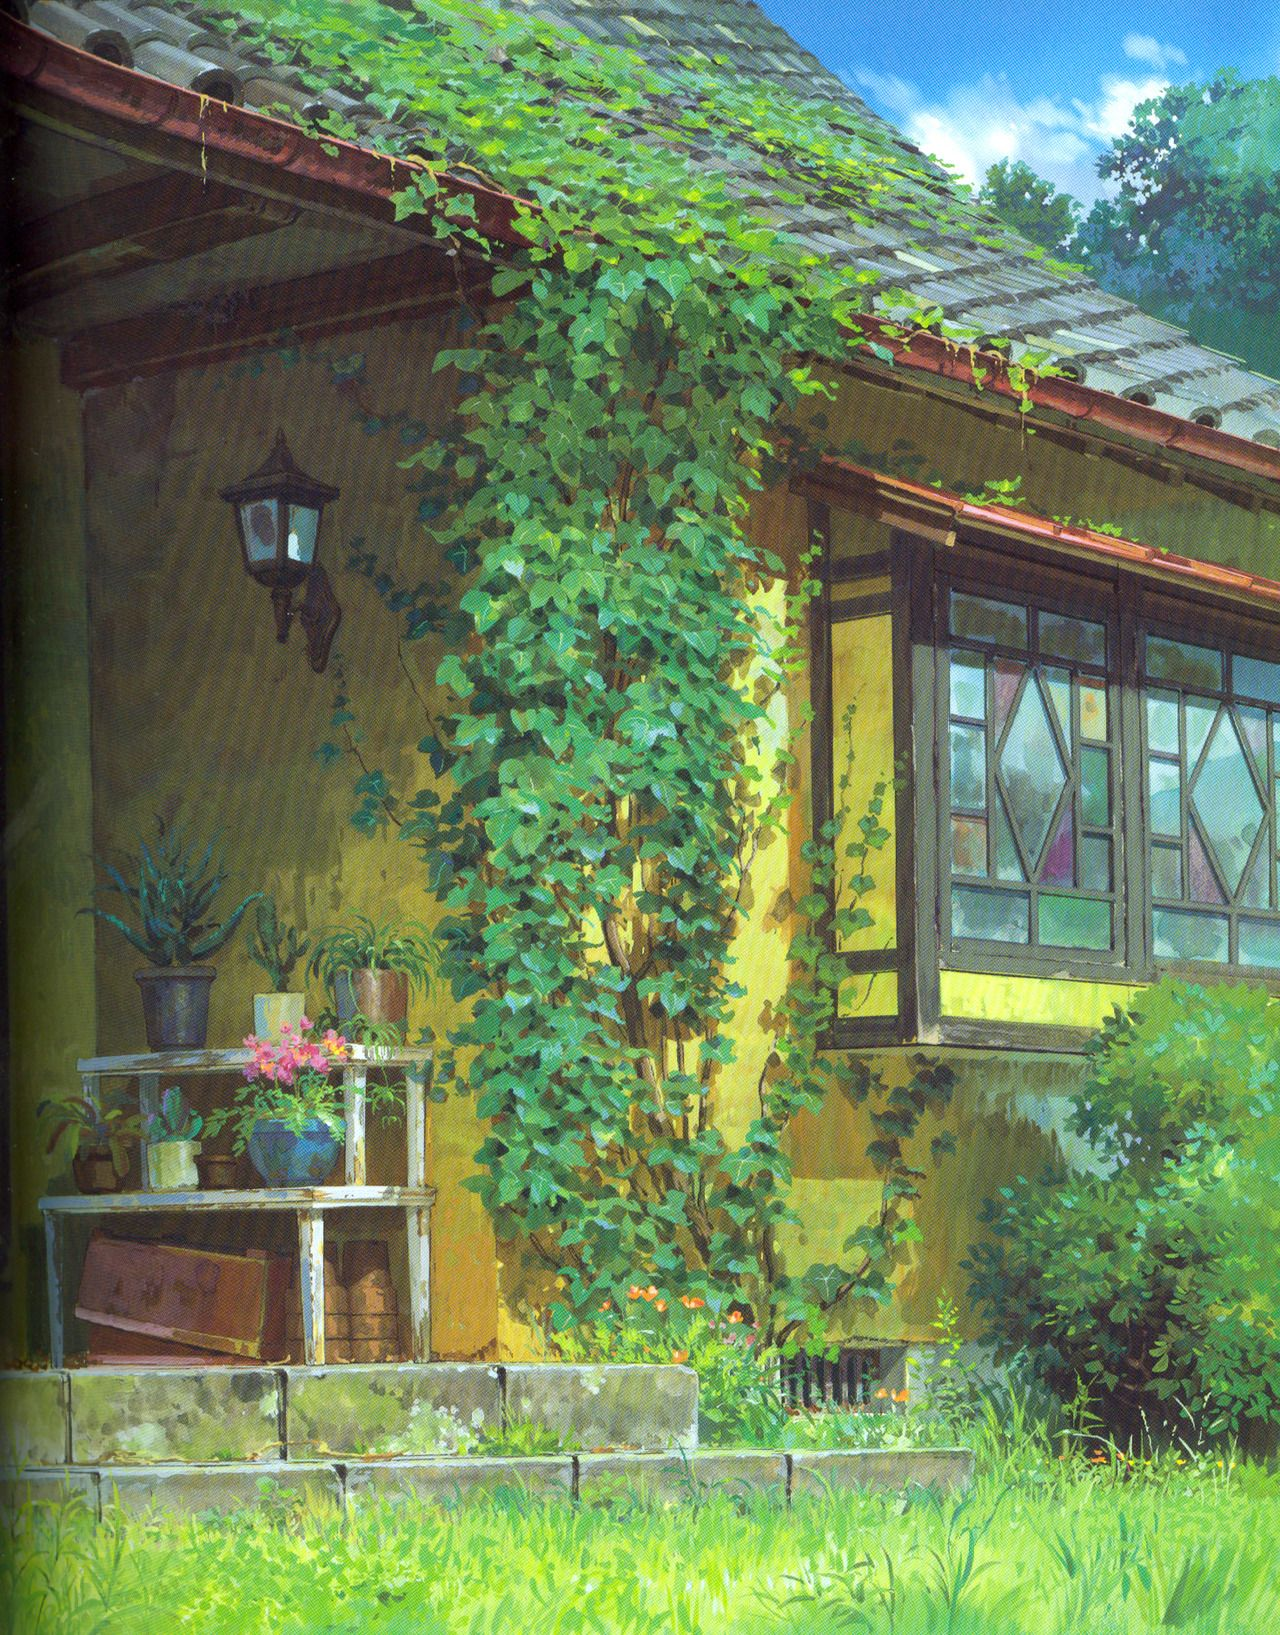 The Secret World Of Arrietty スタジオジブリ 幻想的なイラスト 綺麗なイラスト壁紙背景